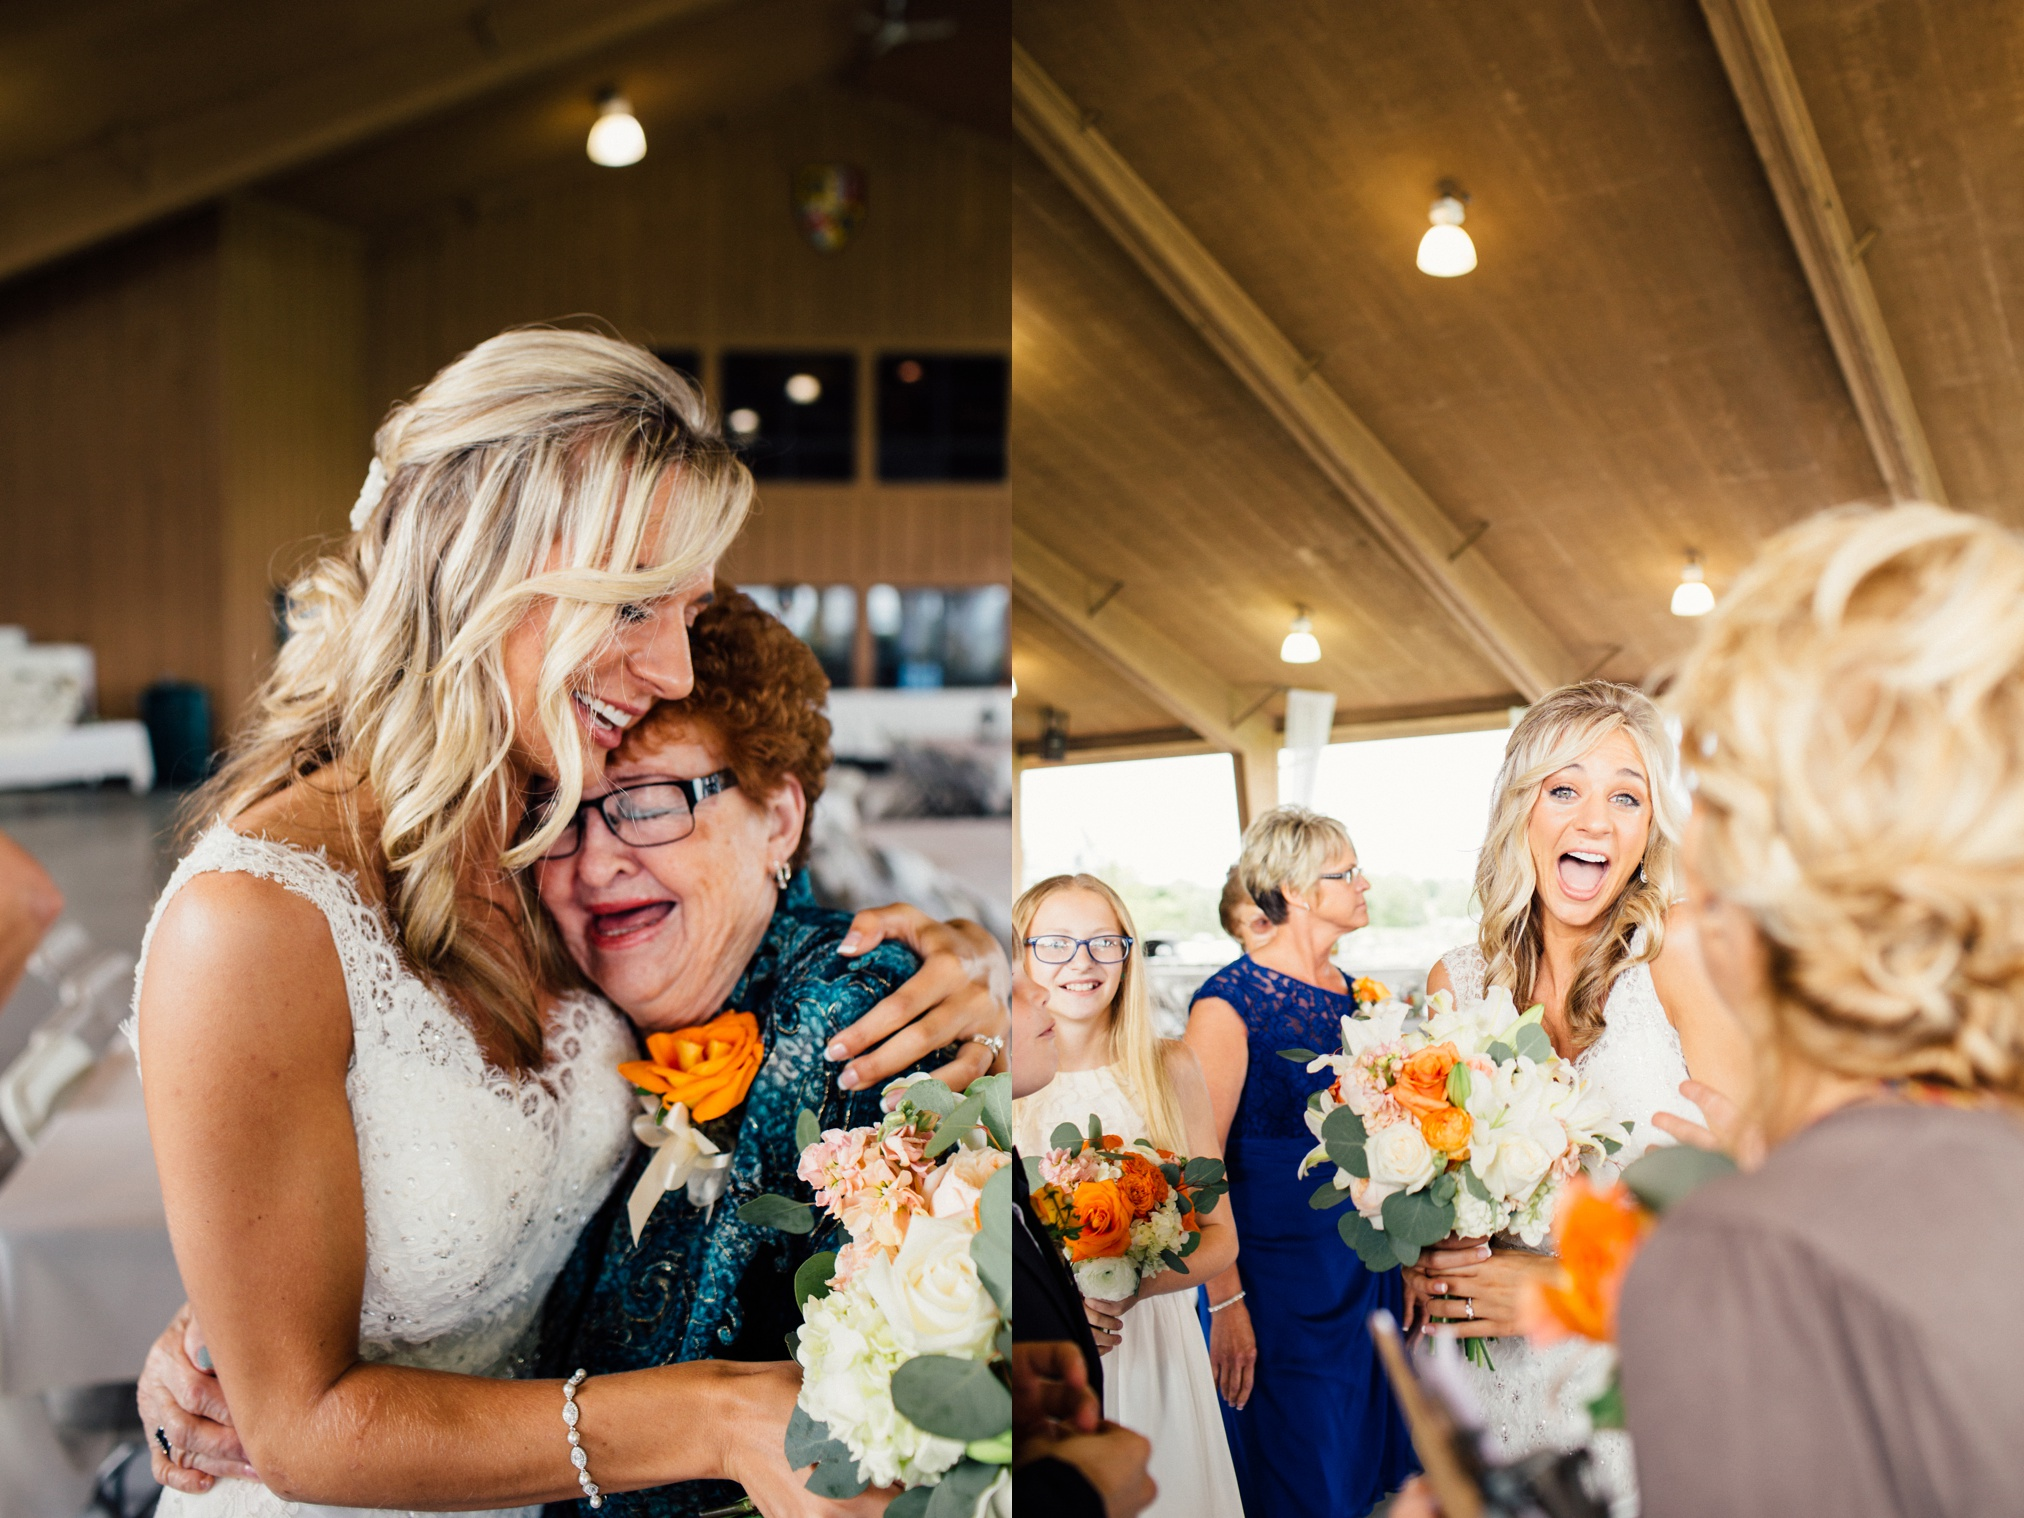 schmid_wedding-589.jpg